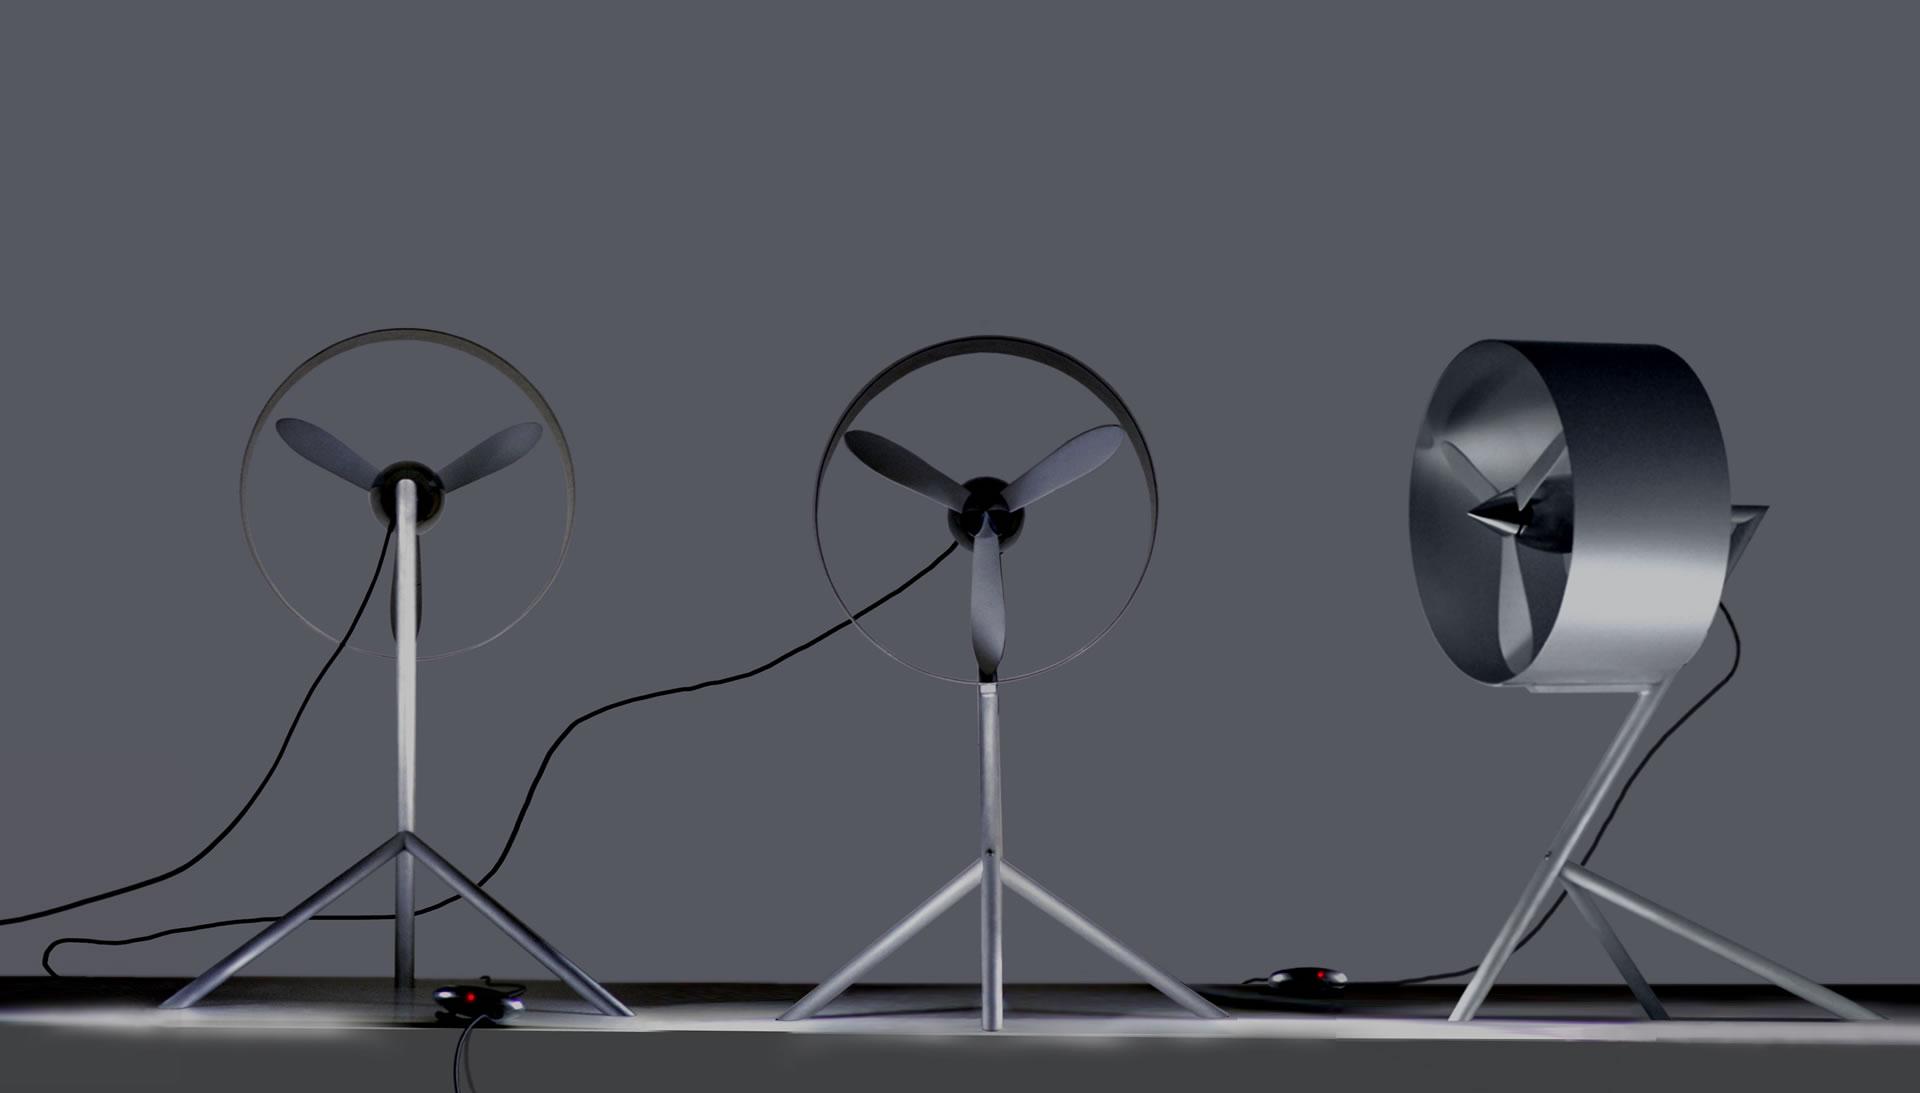 ventilator phi 2 terra bringt frischen wind. Black Bedroom Furniture Sets. Home Design Ideas